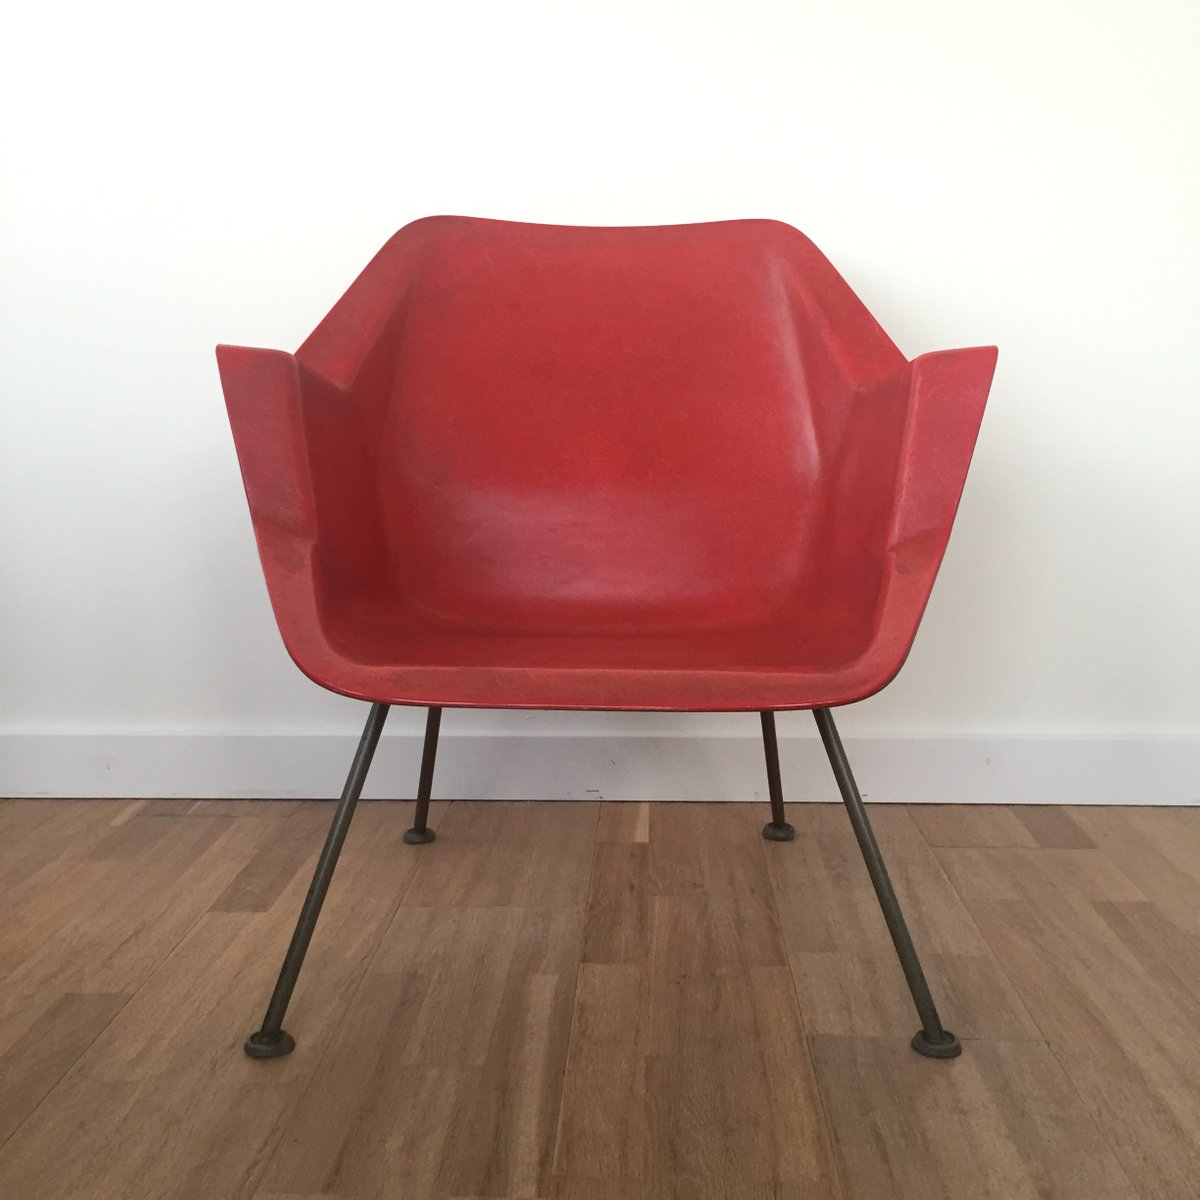 fiberglass shell chair versalite folding arm 416 by wim rietveld andre cordemeyer for gispen 1950s